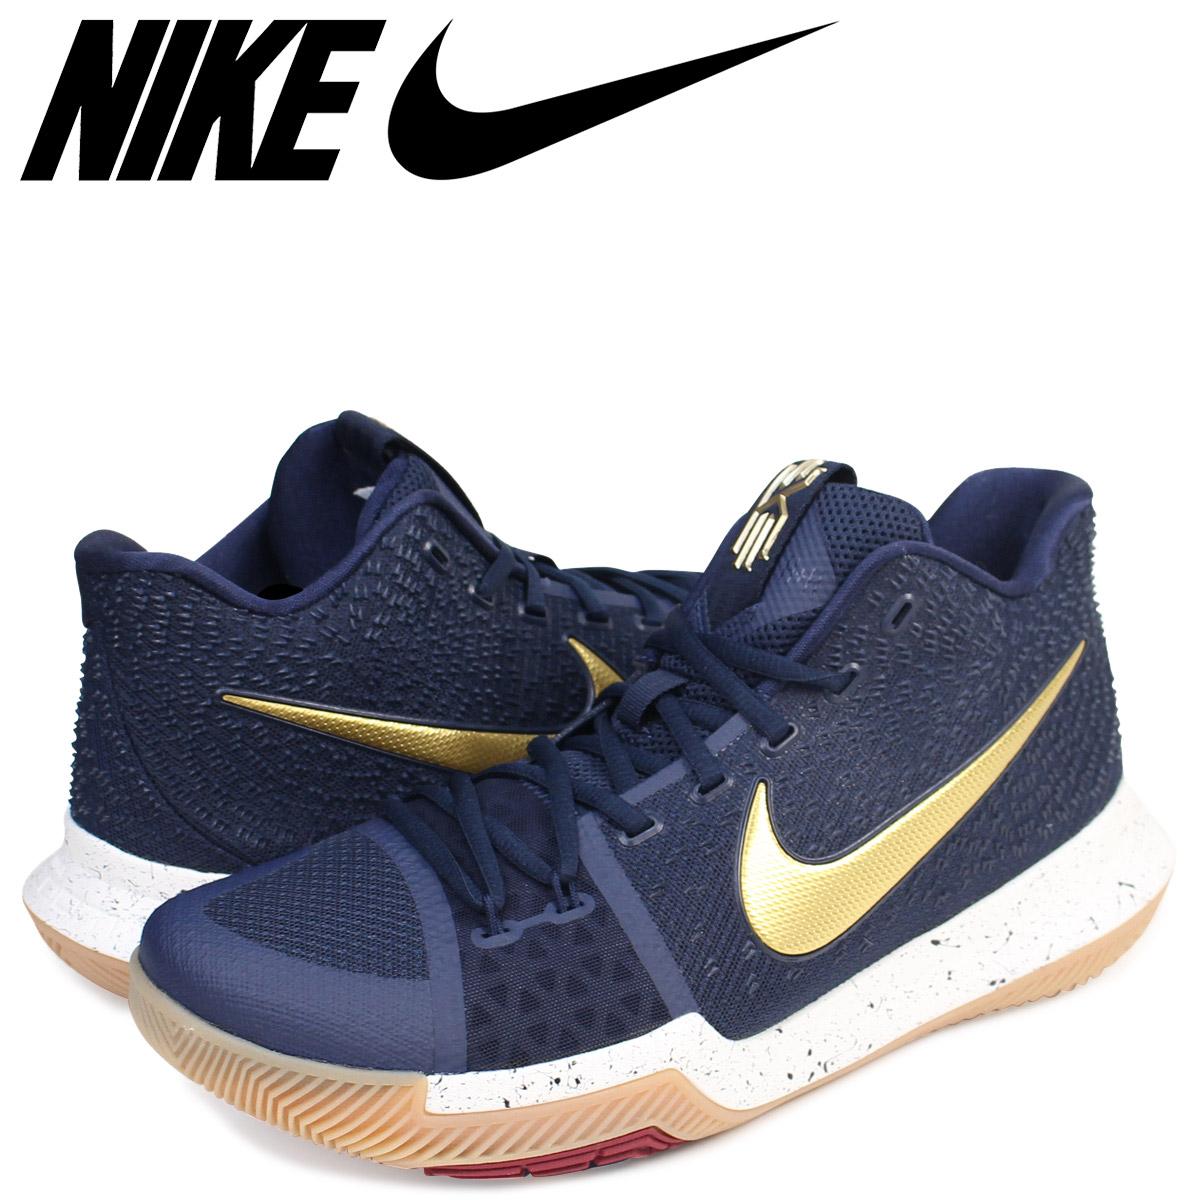 buy popular 205c1 a9967 NIKE Nike chi Lee 3 sneakers KYRIE 3 EP 852,396-400 men's shoes navy